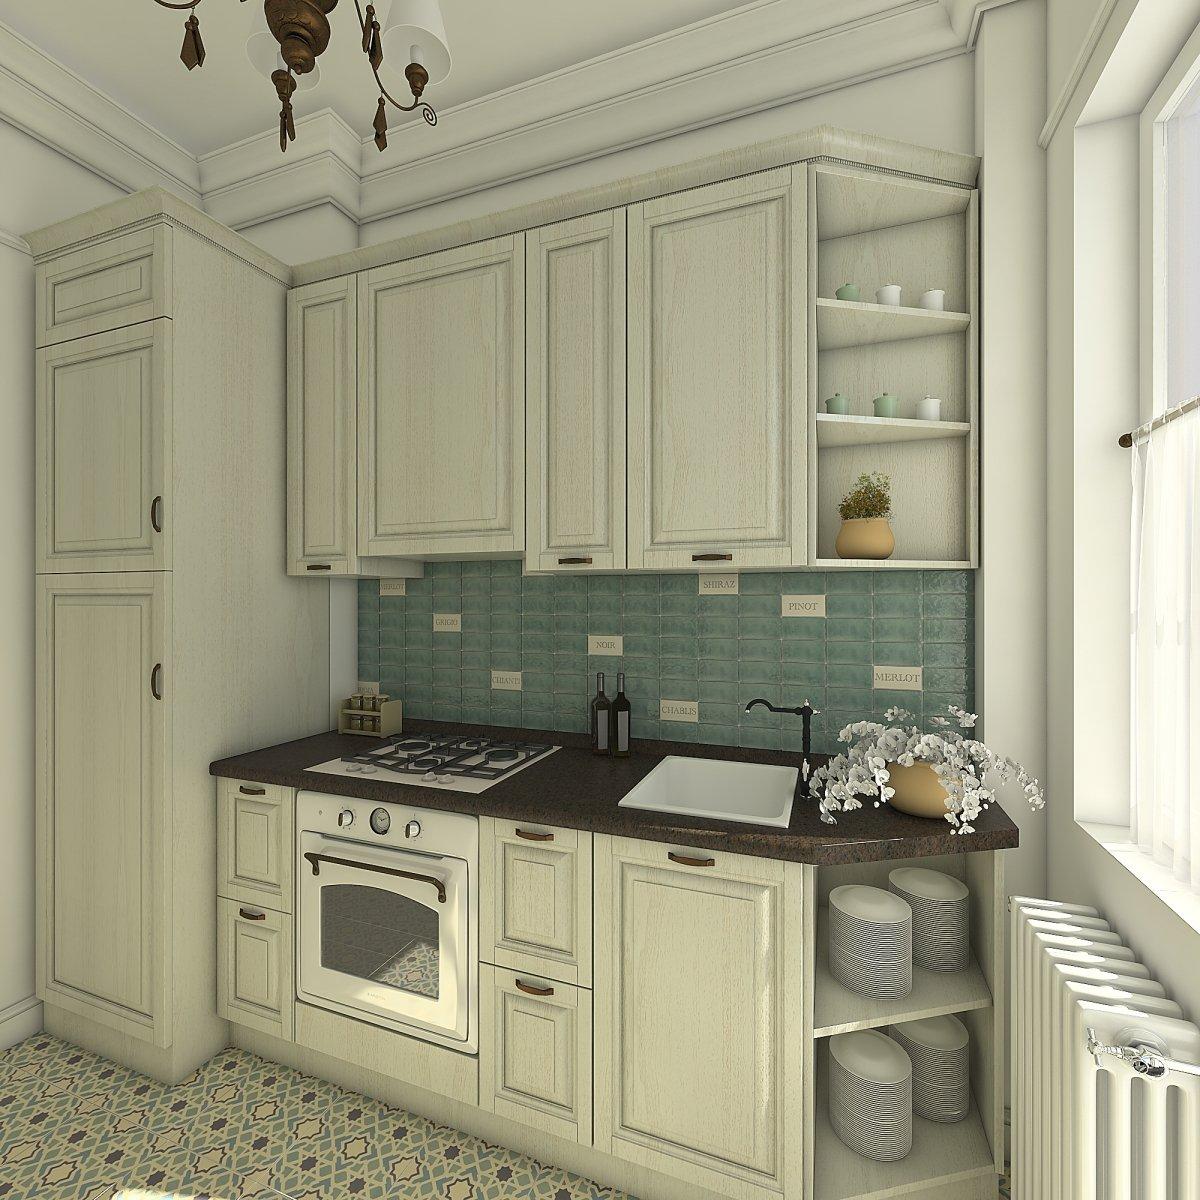 Amenajare apartament eclectic Bucuresti- Piata Romana-18